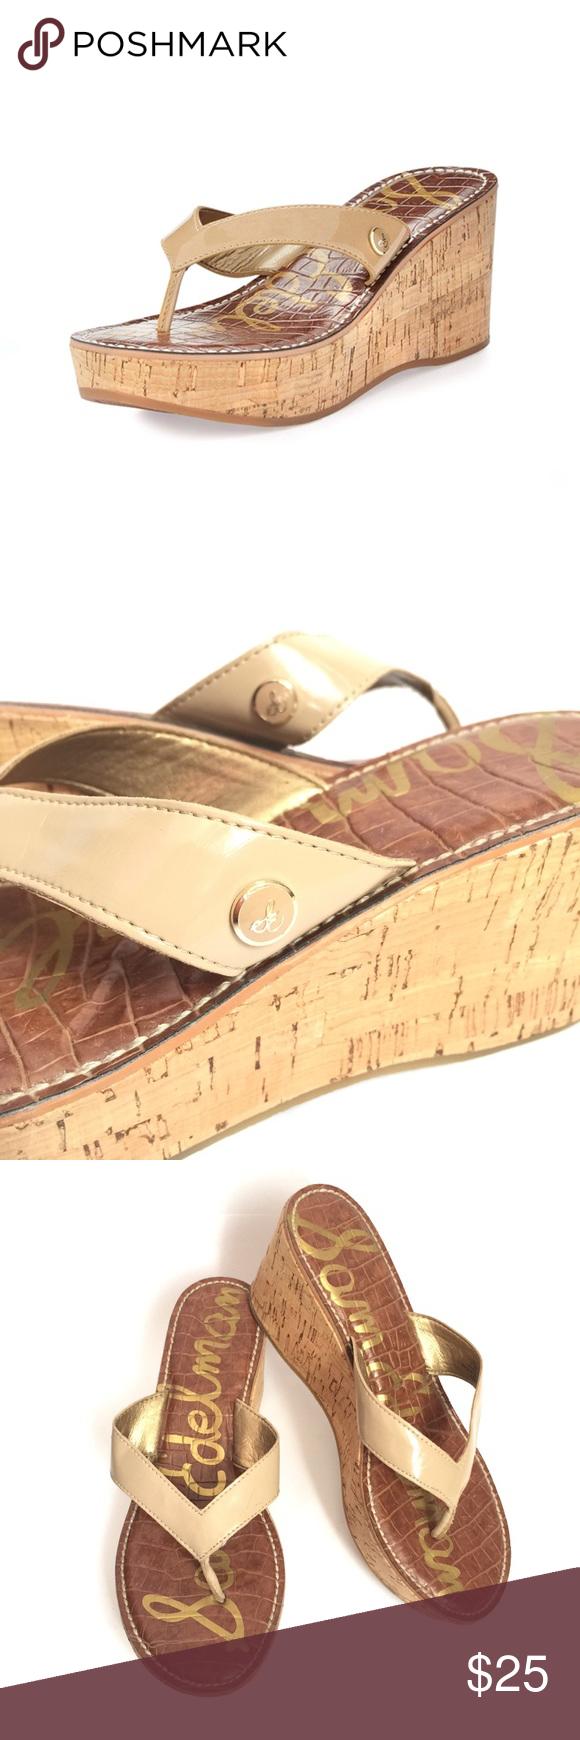 21c973ebd0a0b2 Sam Edelman Romy Patent Leather Cork Wedge Thong Sam Edelman s  Romy  is  sure to